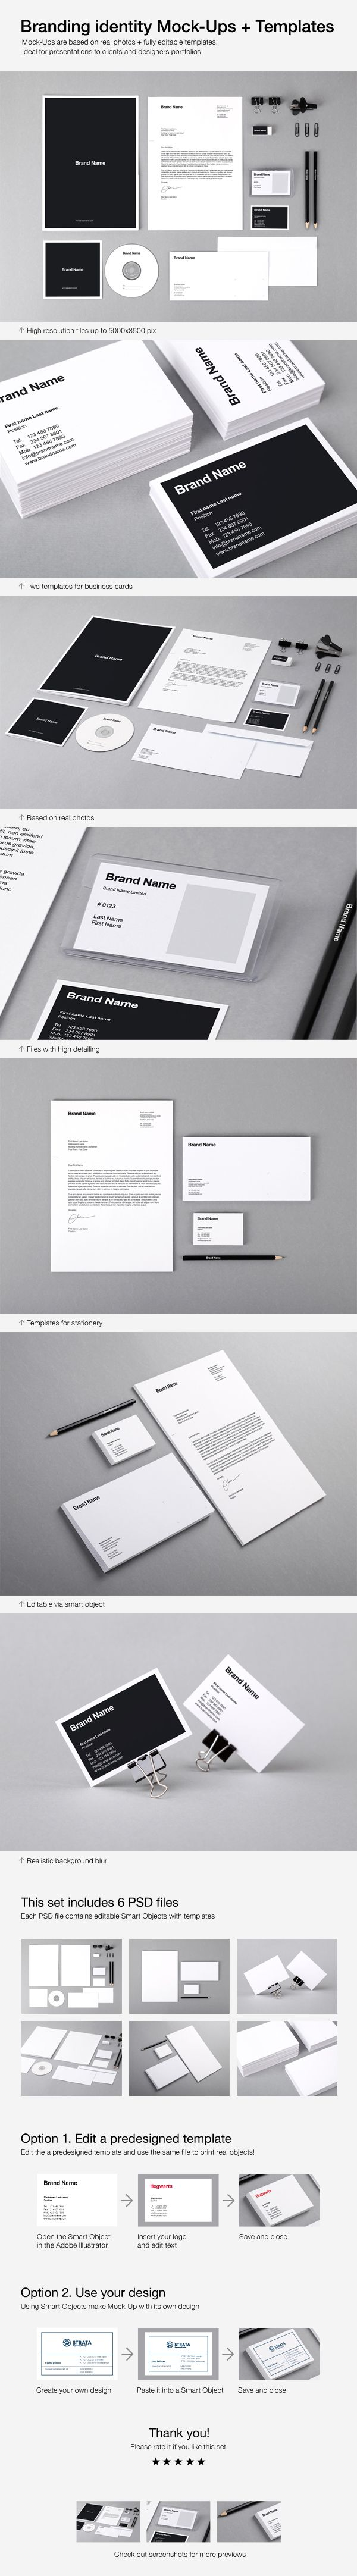 Branding Identity Mock-Ups and Templates by Vitaly Stepanenko on Behance. #mockups #brand #identity